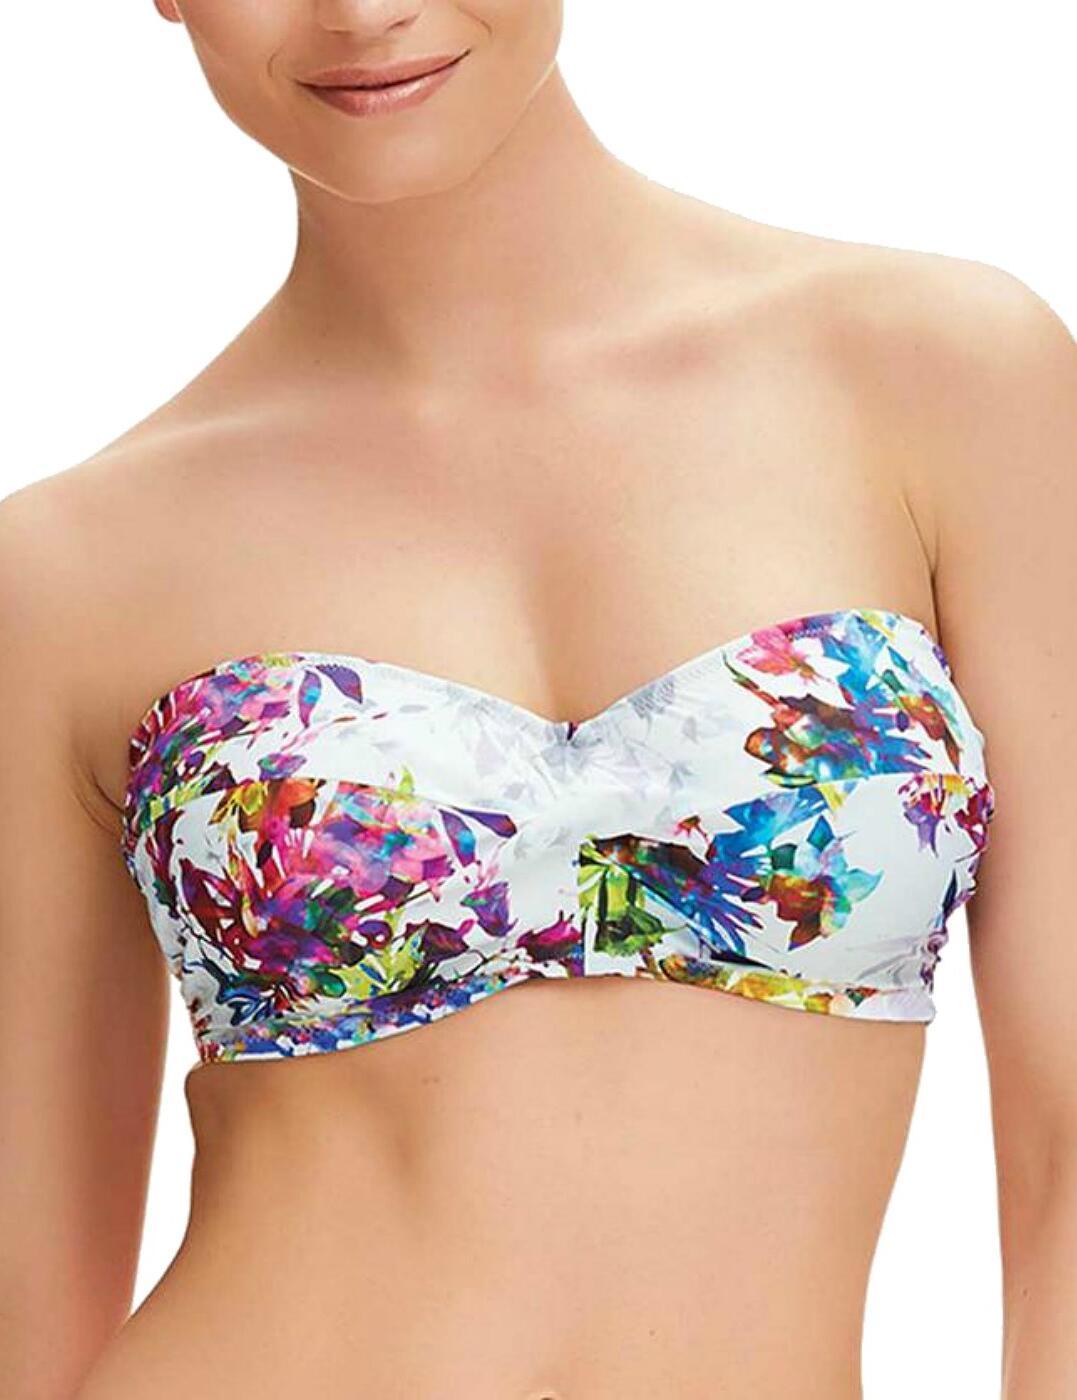 6322 Fantasie Agra Underwired Twist Bandeau Multiway Bikini Top - 6322 Multi